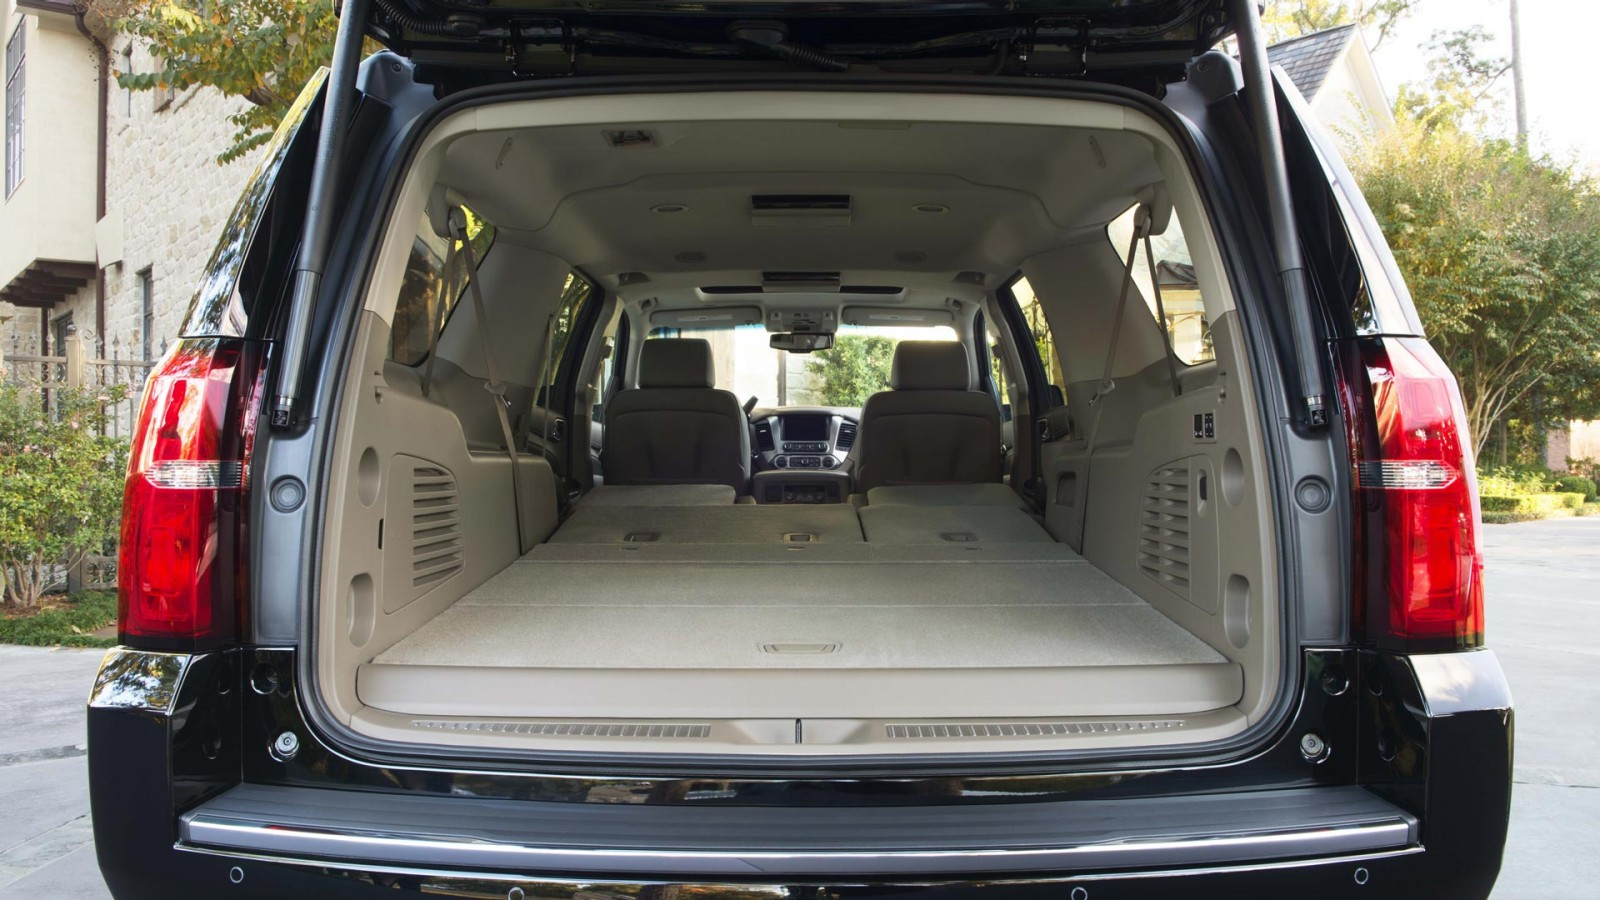 New chevrolet suburban interior image 1